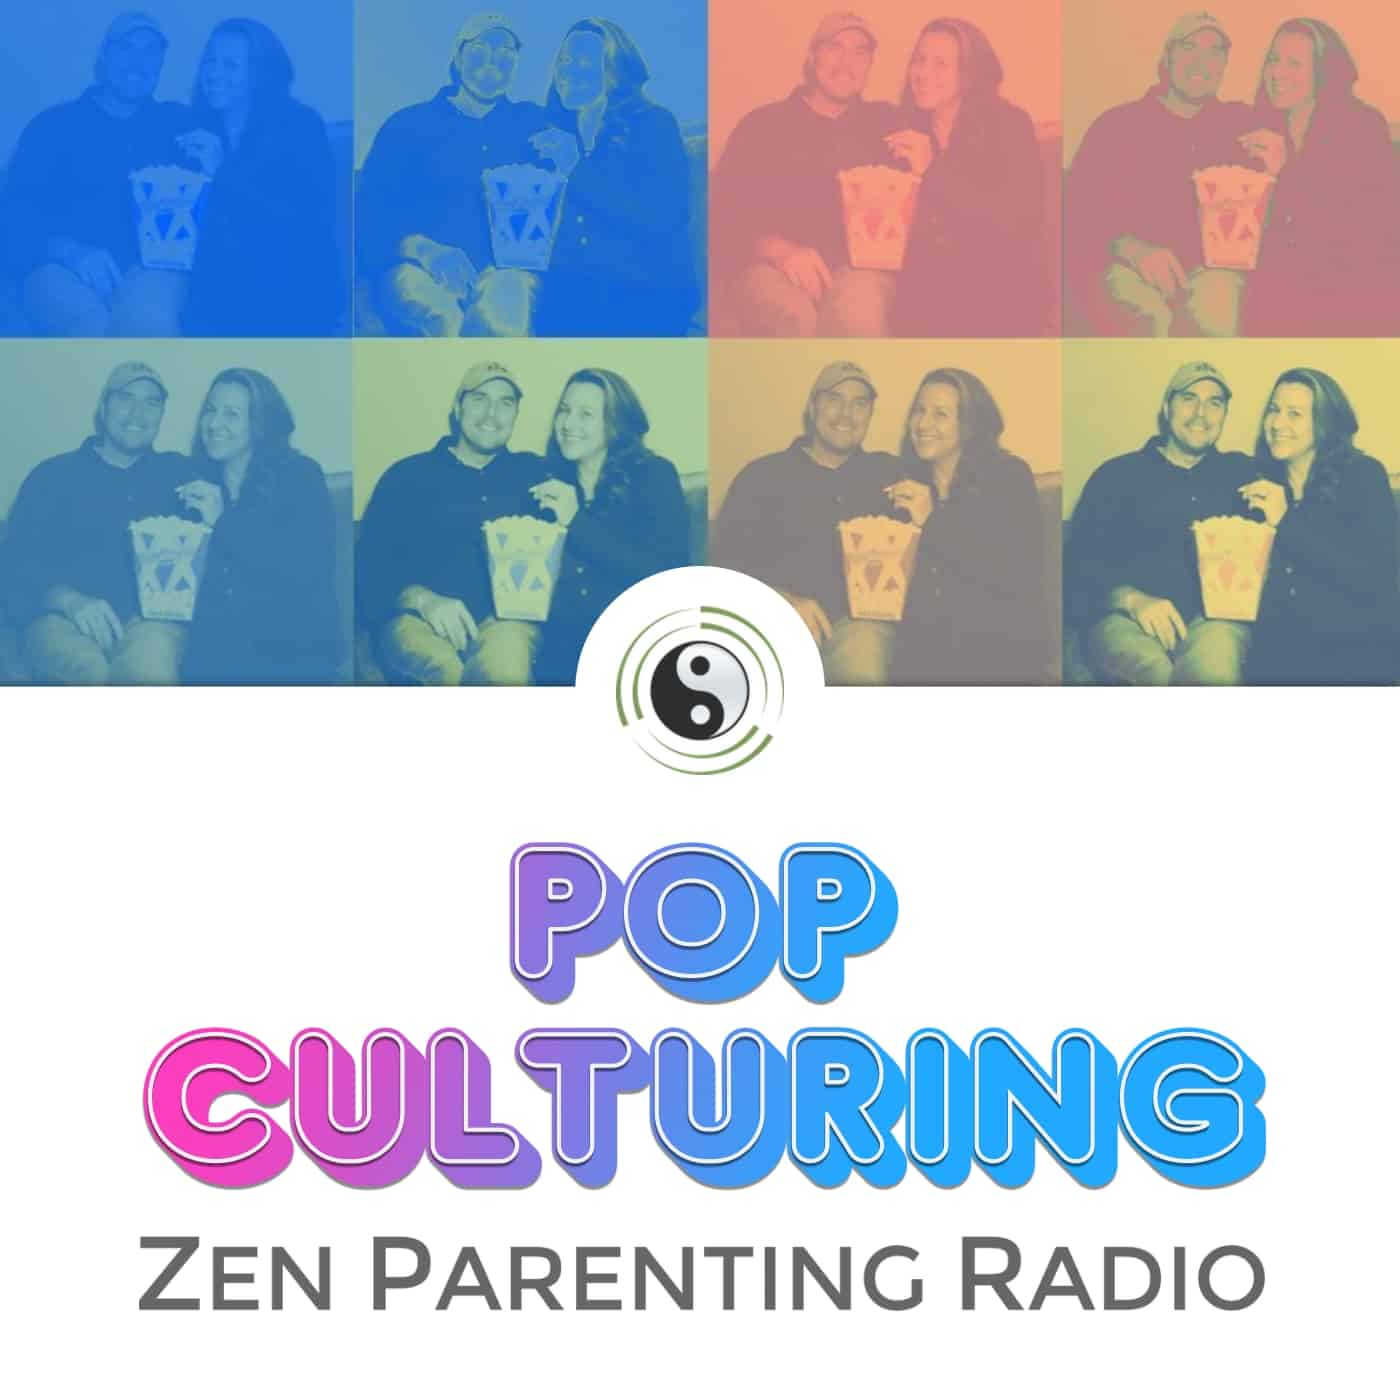 Pop Culturing